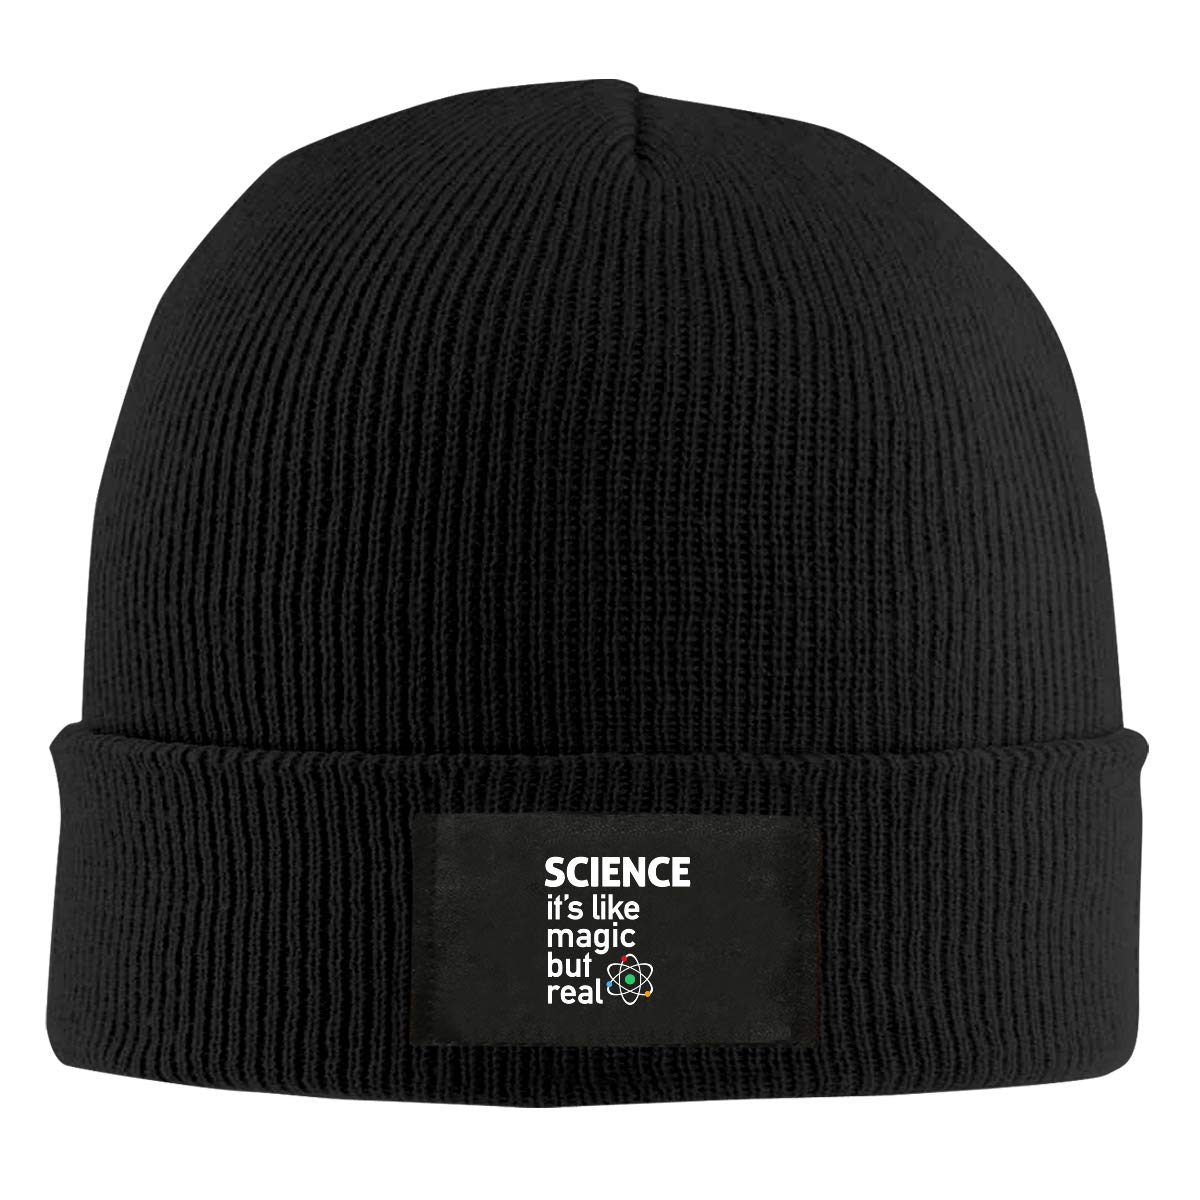 LRHUI Science Winter Knitted Hat Warm Wool Skull Beanie Cap